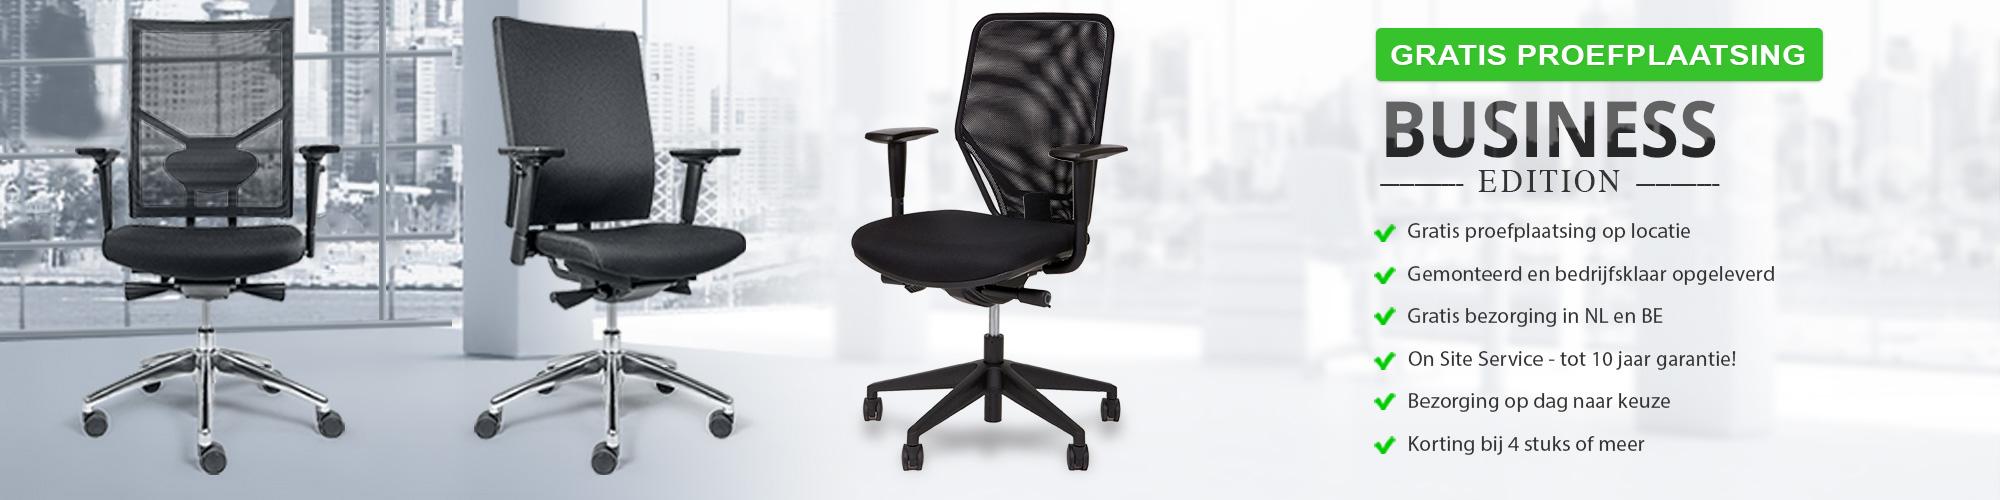 Nieuwe Bureau Stoel.Proefplaatsing Bureaustoelen